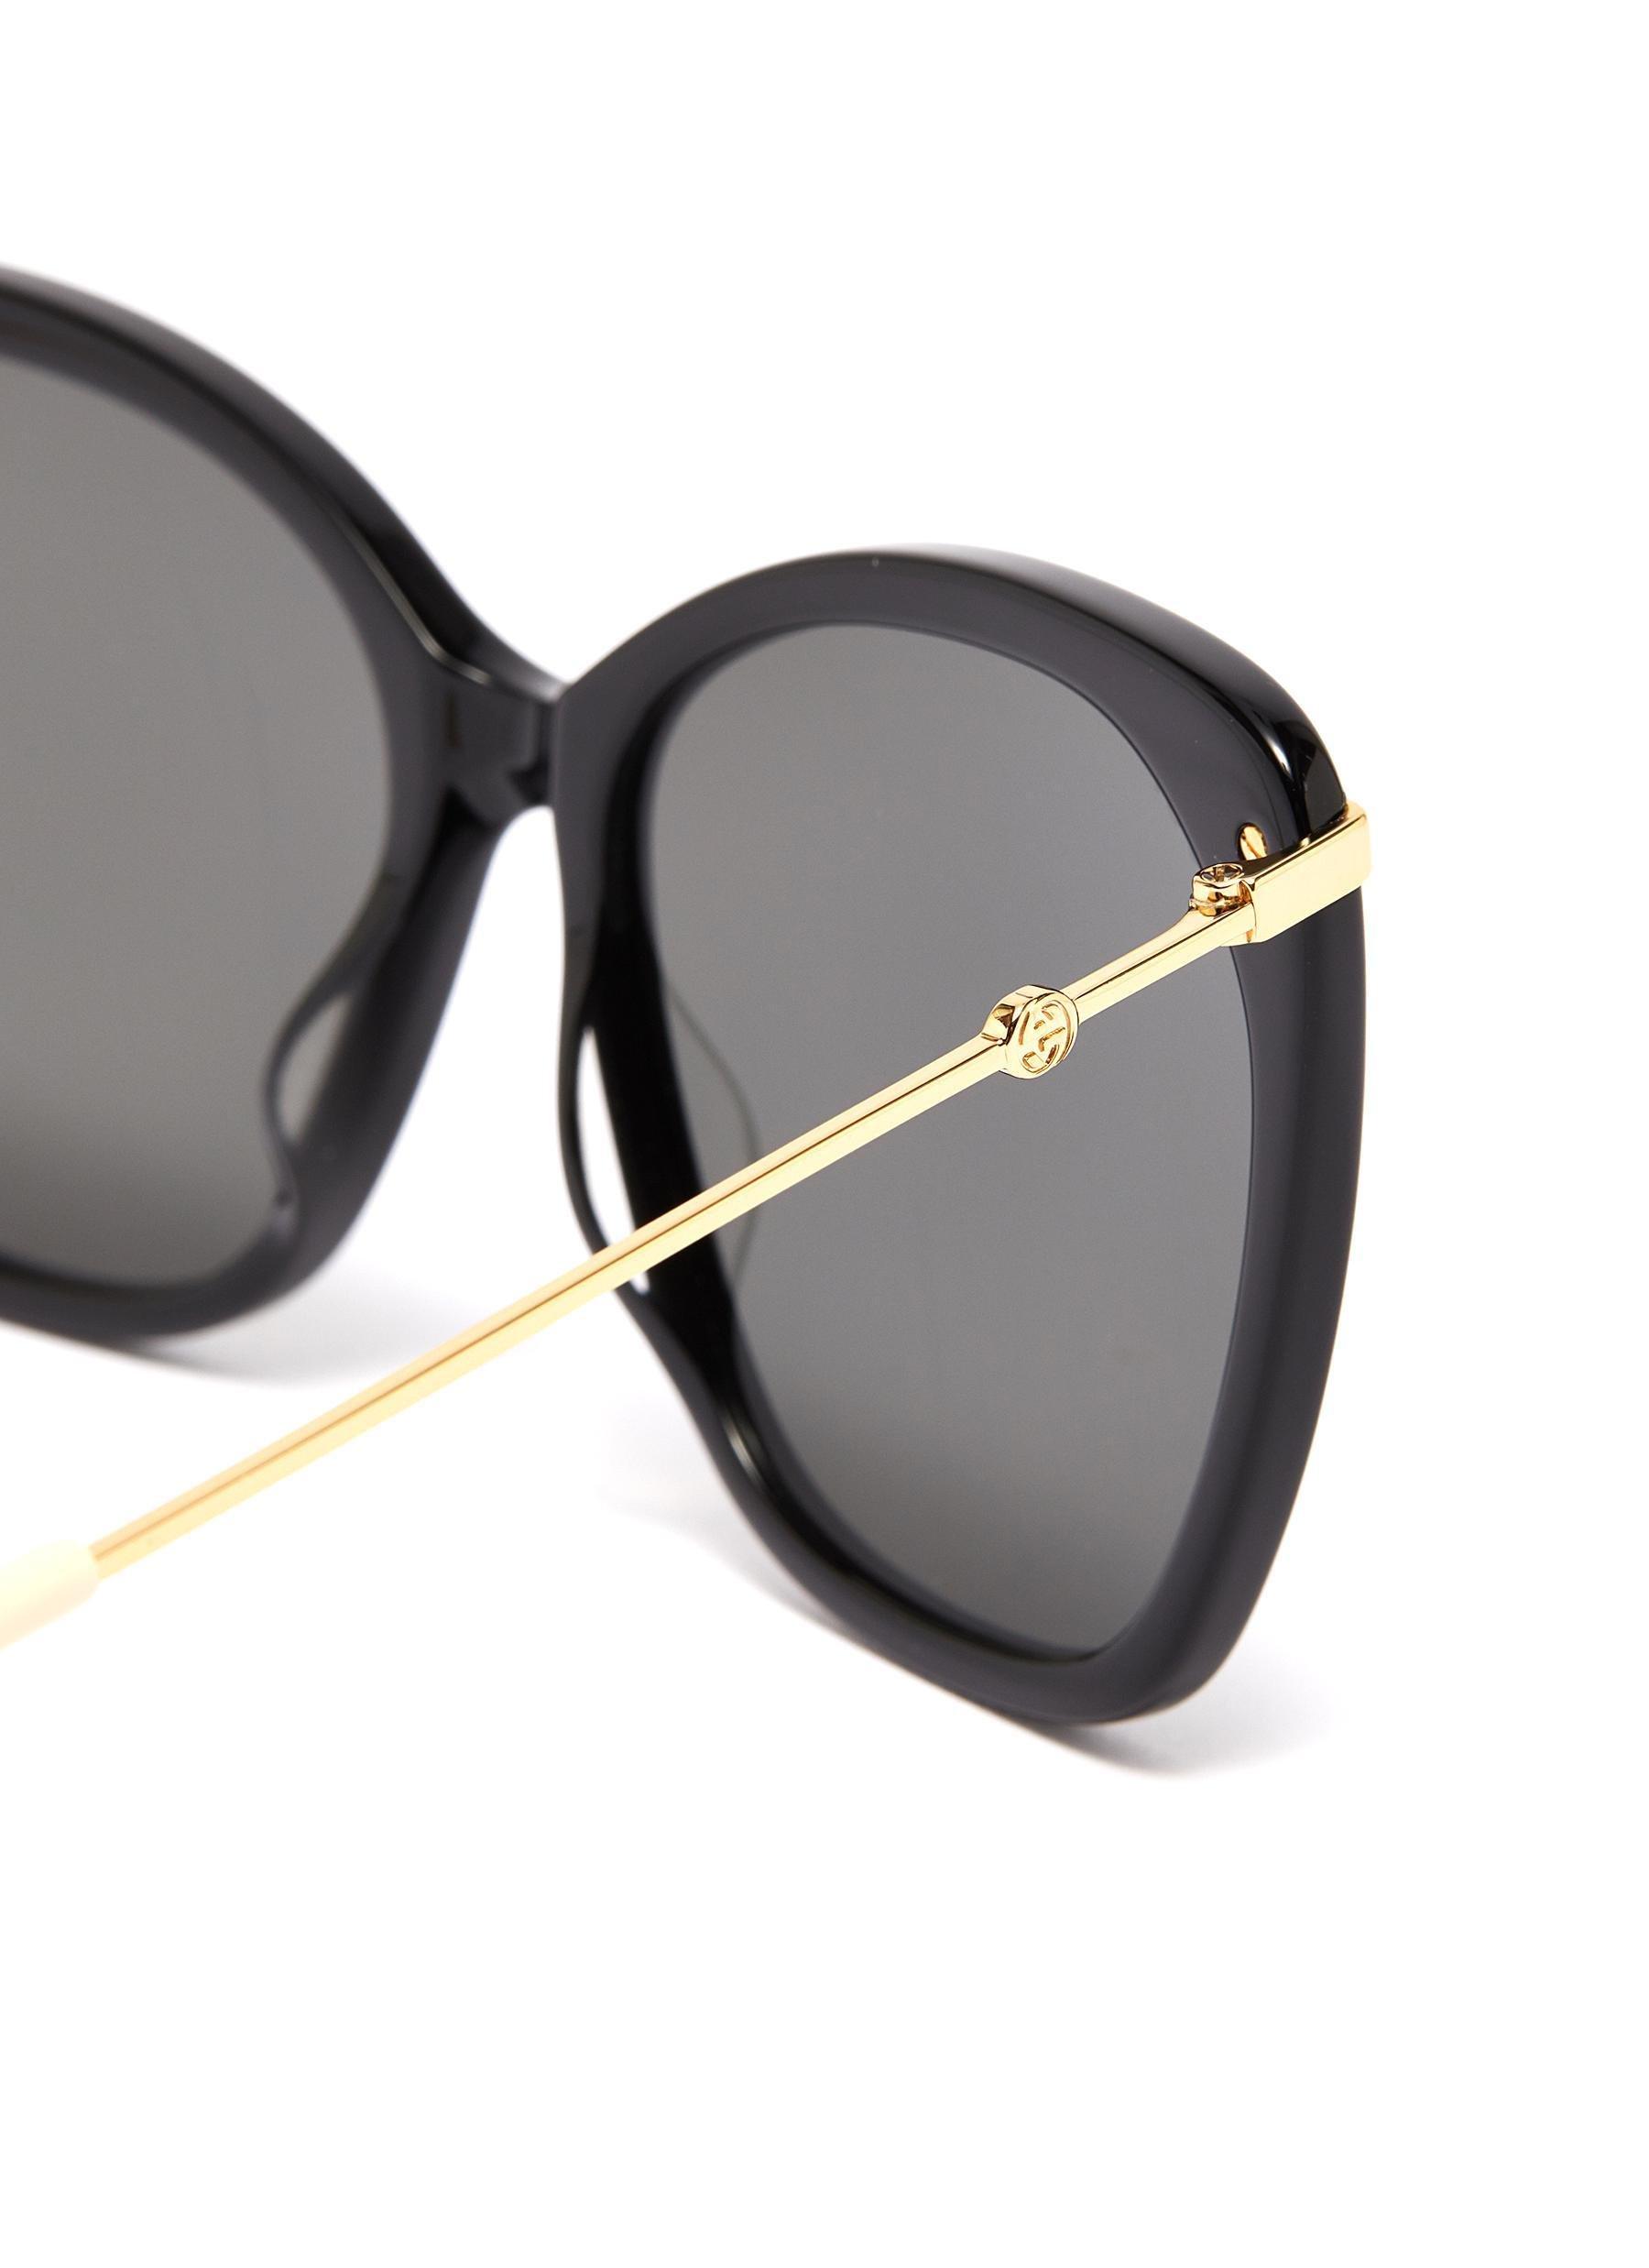 133edbfaade7 Gucci - Black Metal Temple Oversized Acetate Butterfly Sunglasses - Lyst.  View fullscreen